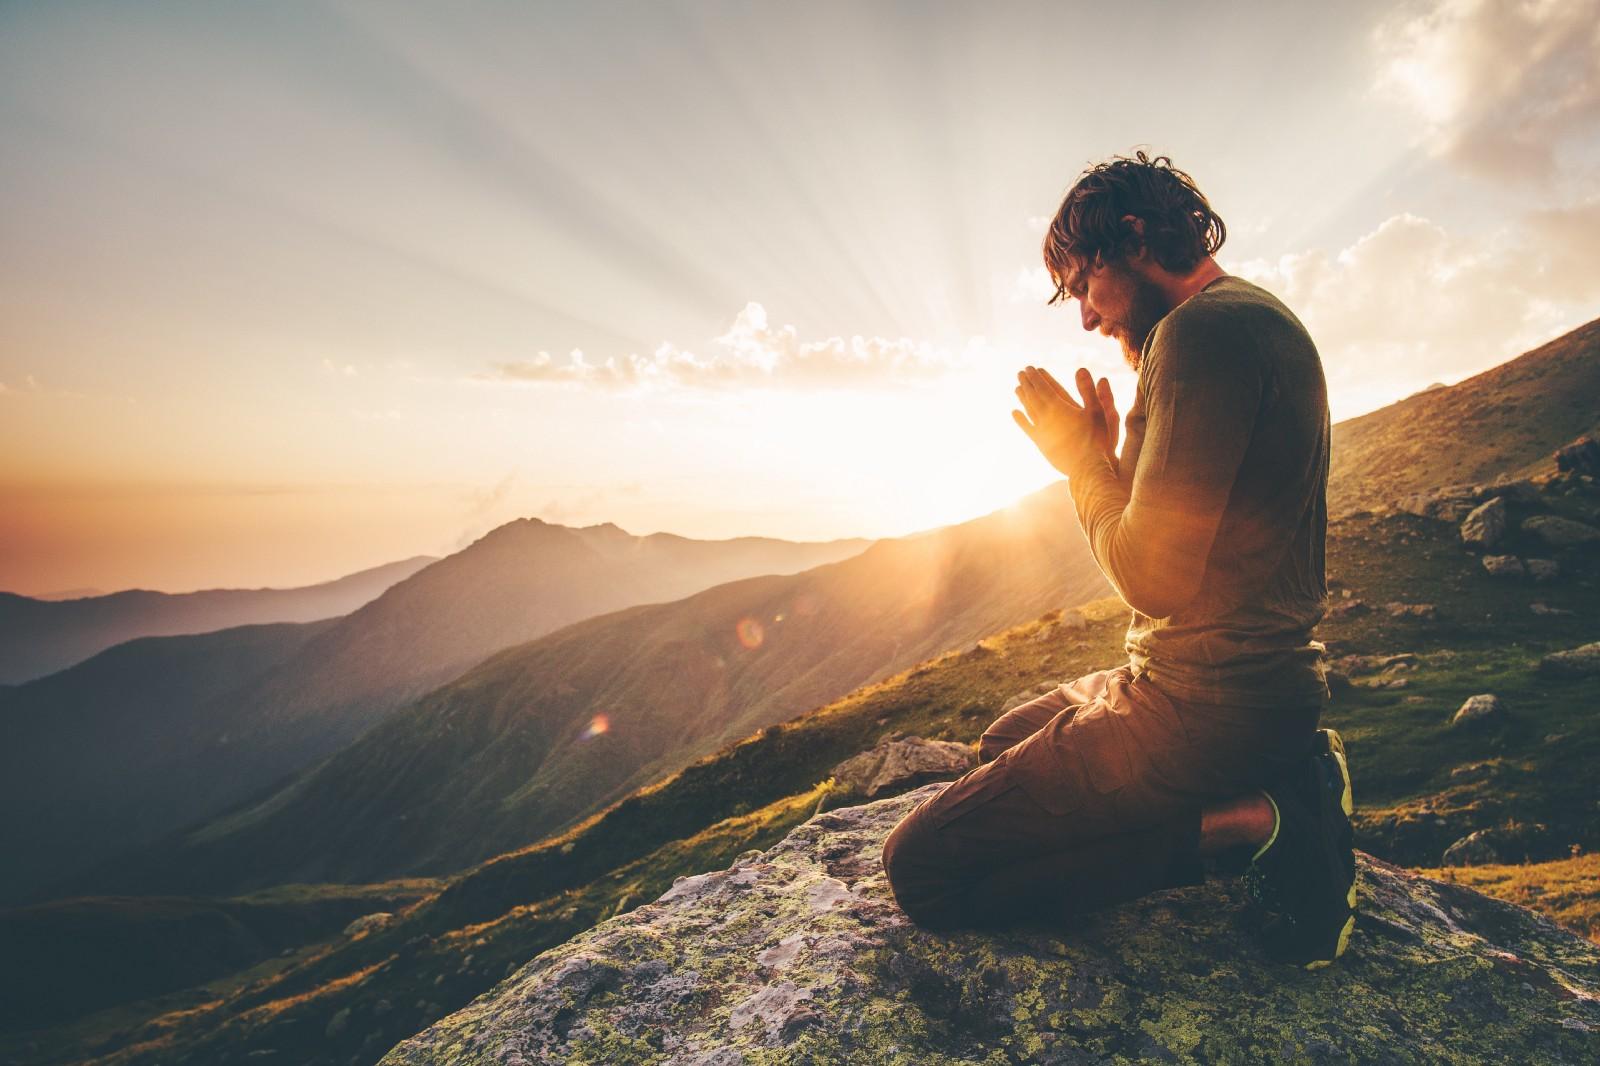 Благодарность меняет даже самую тяжелую судьбу